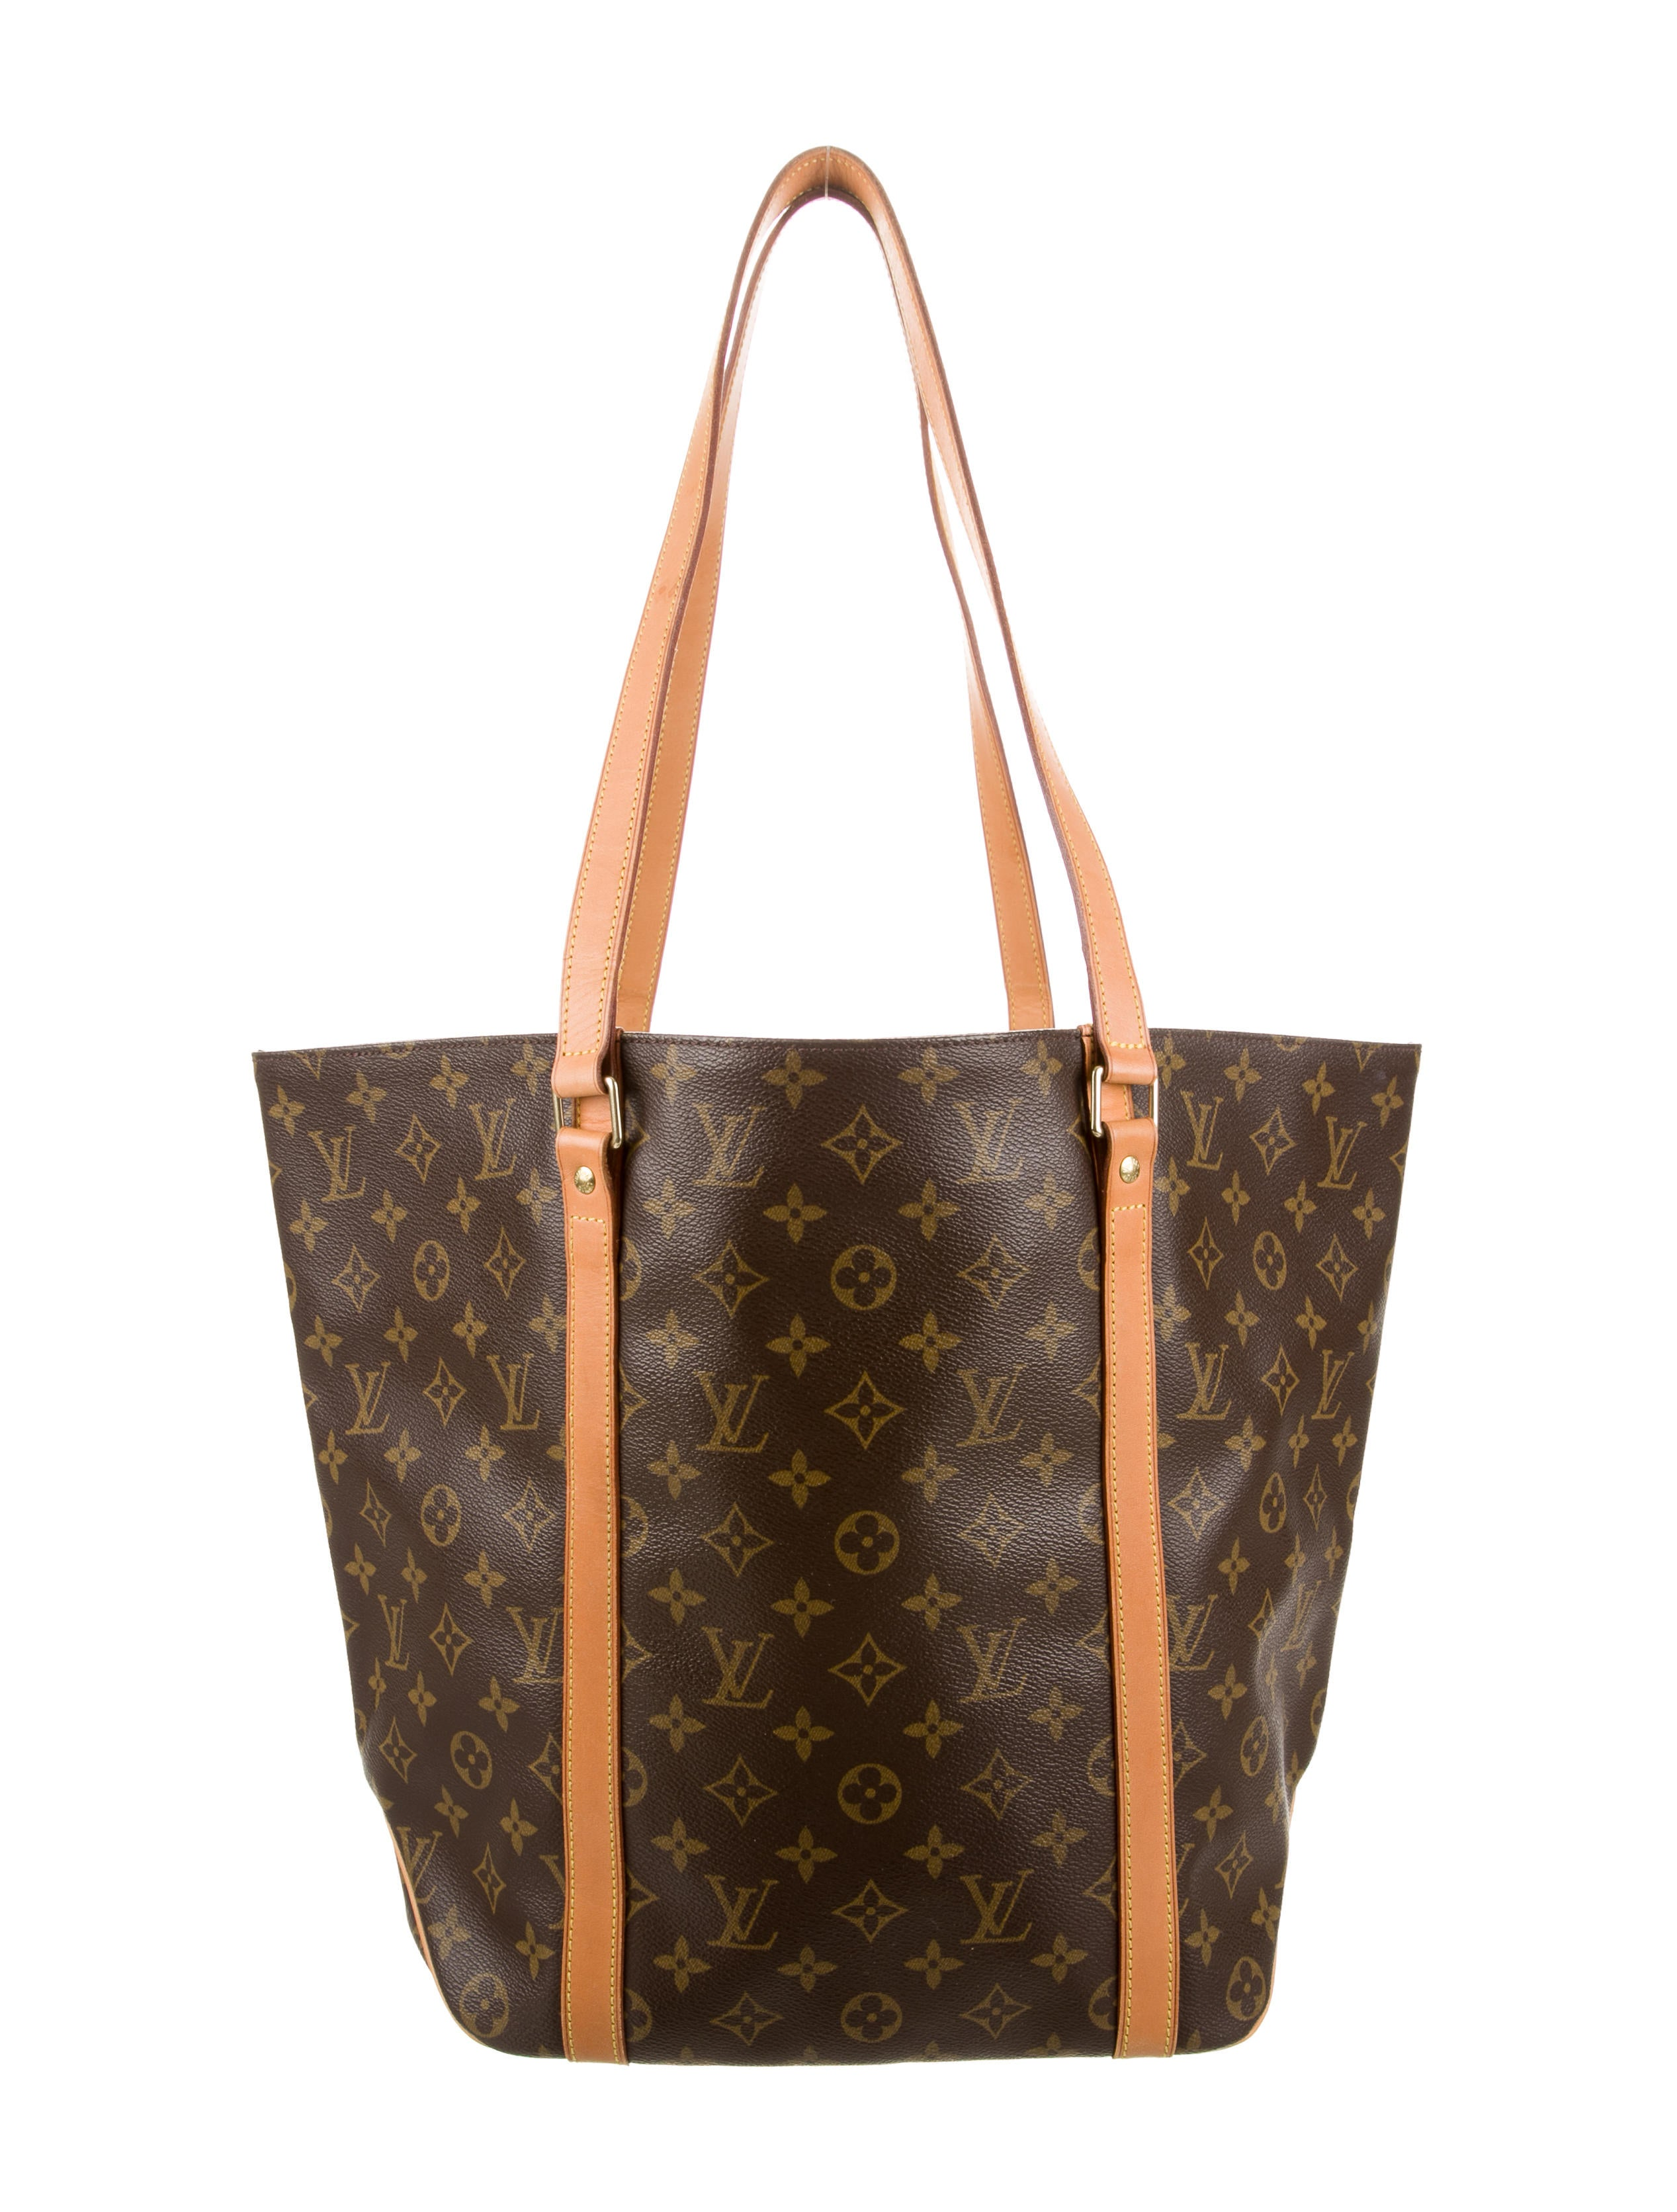 louis vuitton monogram sac shopping pm handbags. Black Bedroom Furniture Sets. Home Design Ideas